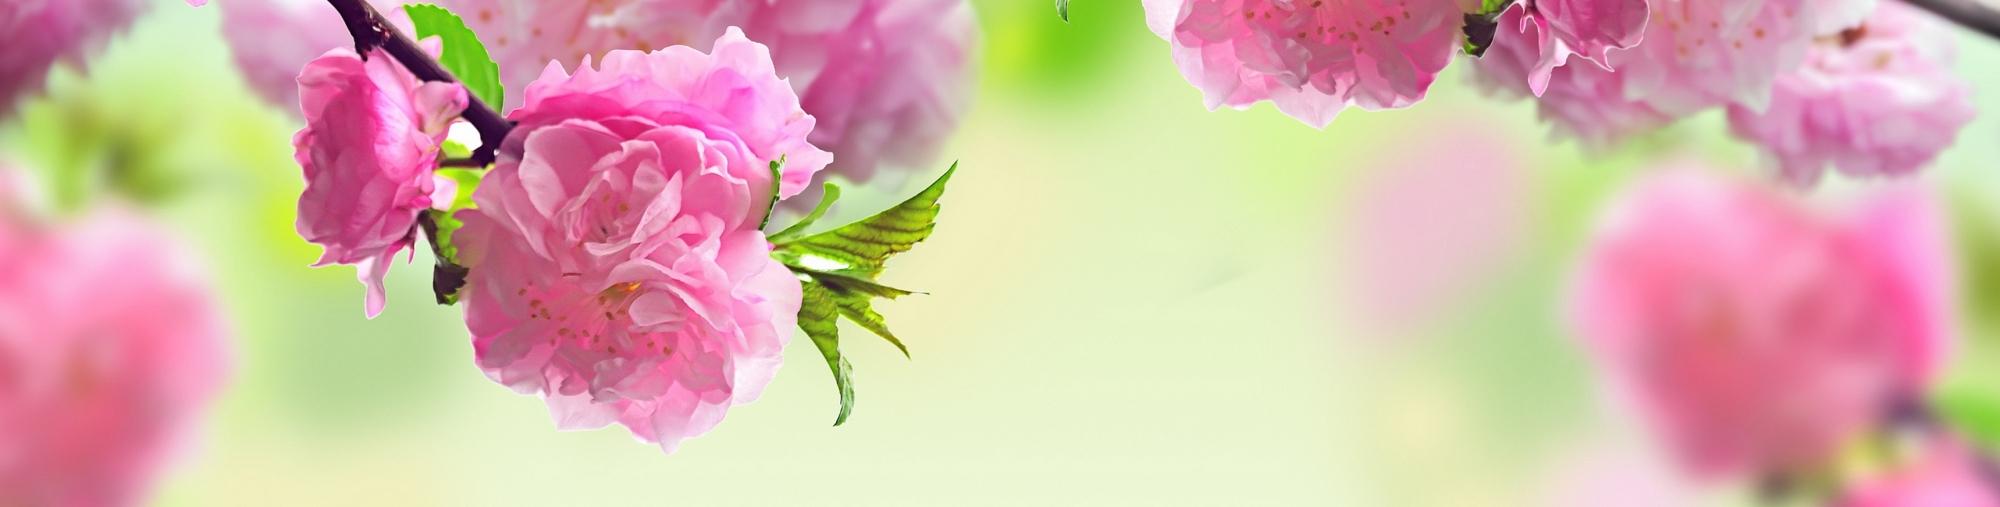 893373-spring-flowers